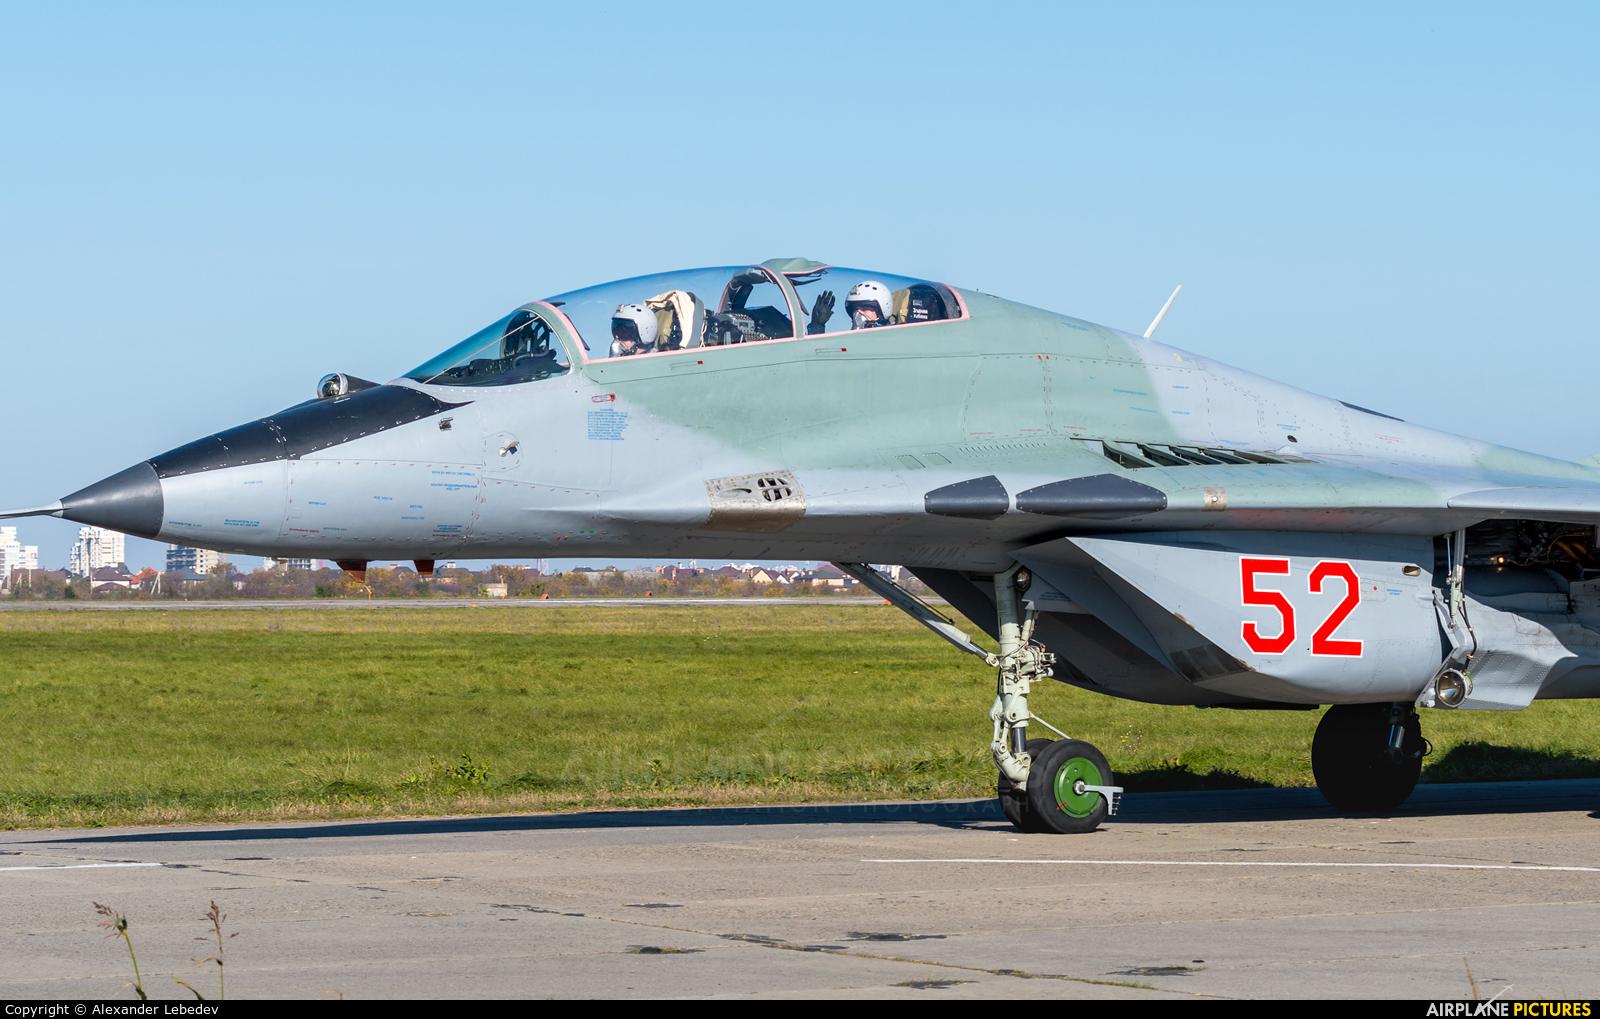 Russia - Air Force 52 aircraft at Krasnodar Tsentralny